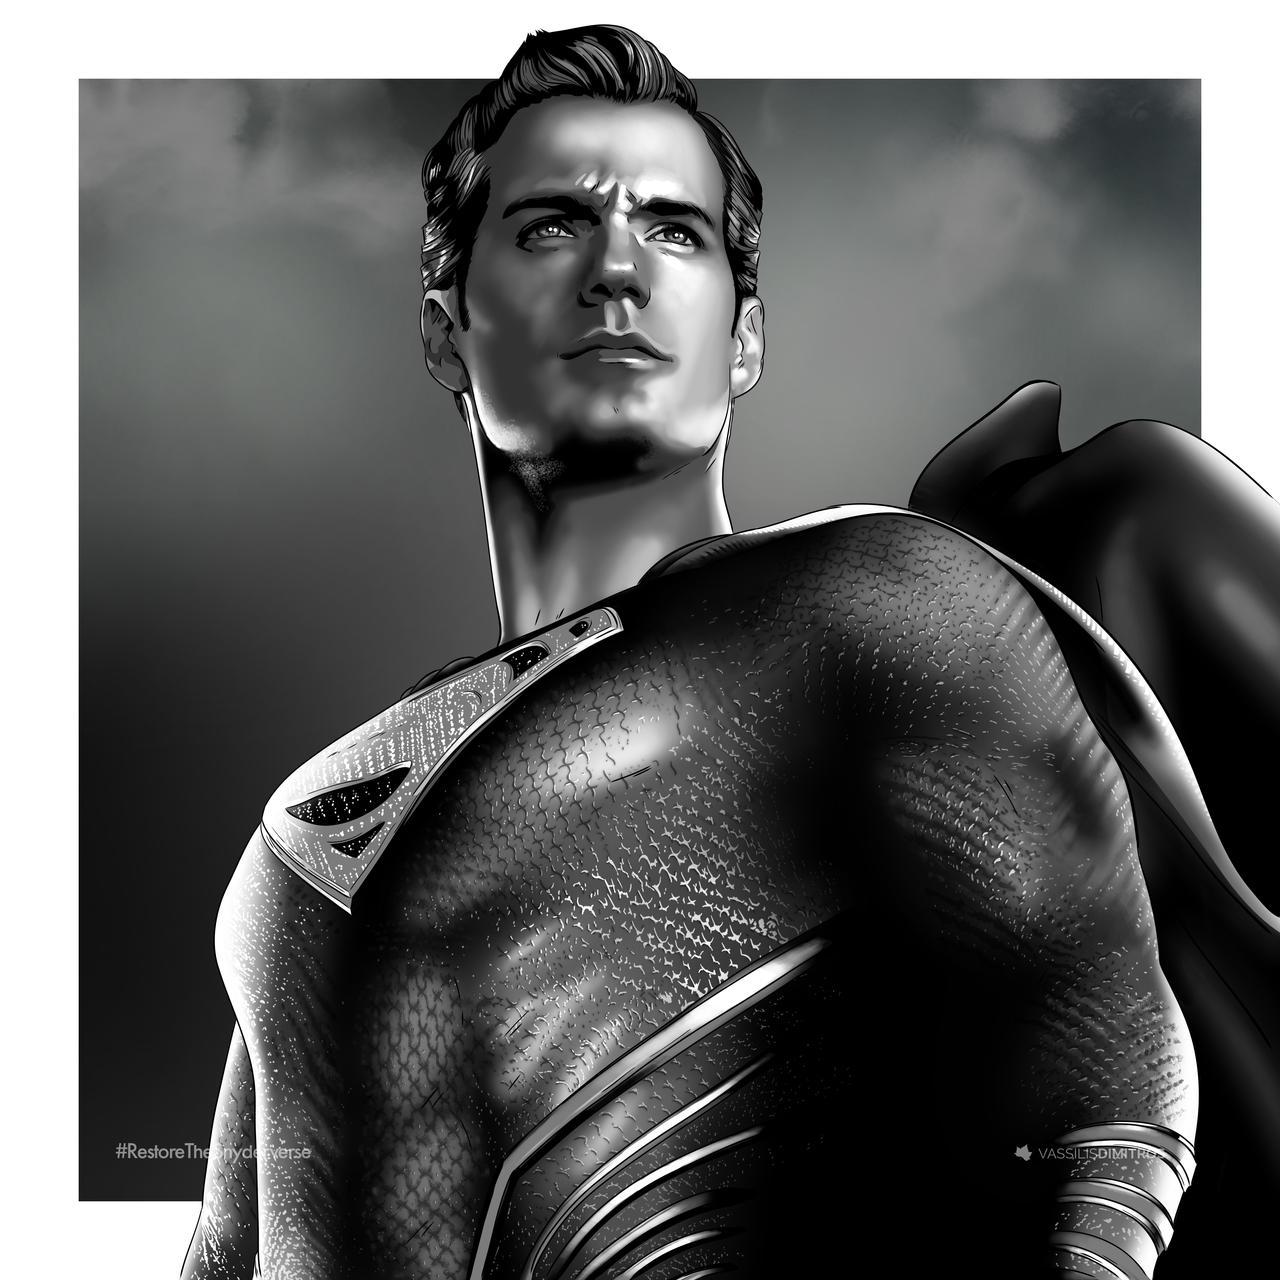 Zack Snyder's Justice League - Superman